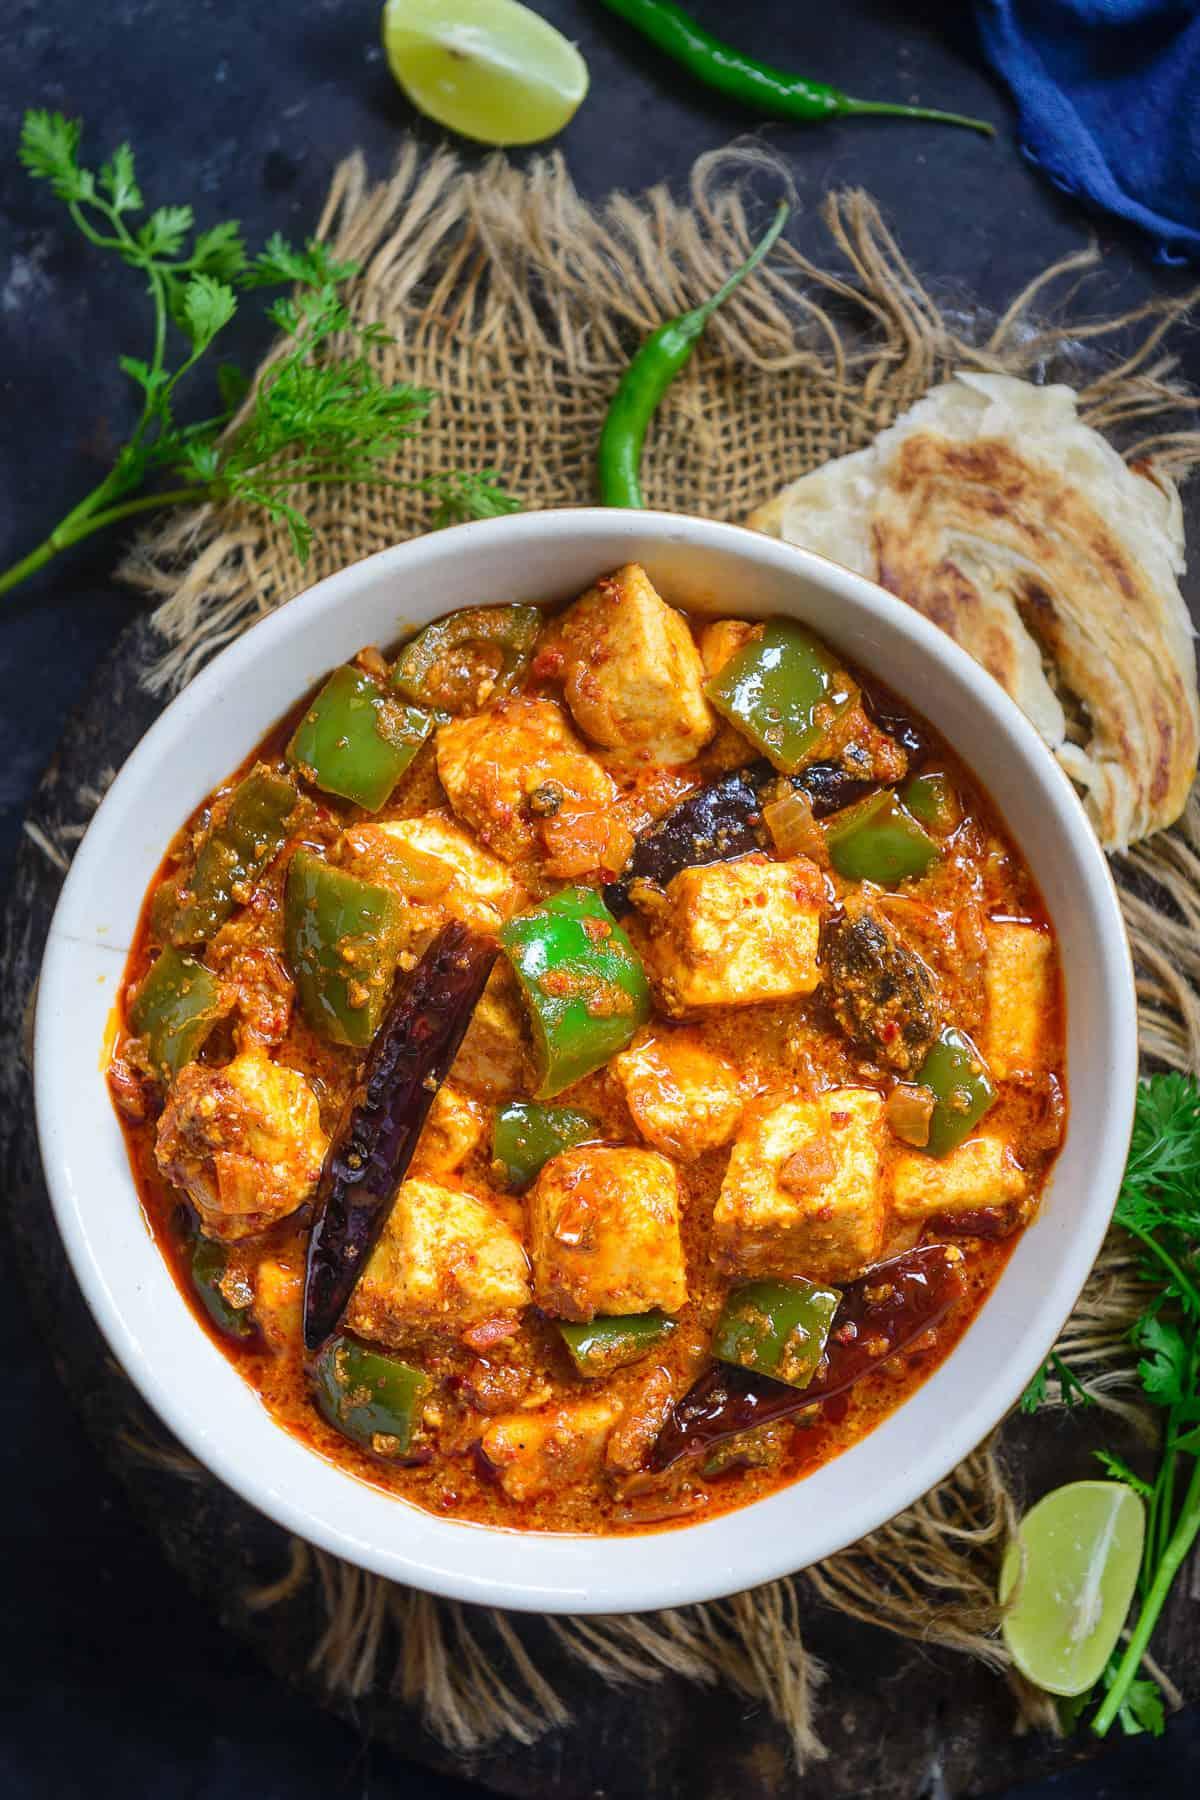 Kadai Paneer served in a bowl.